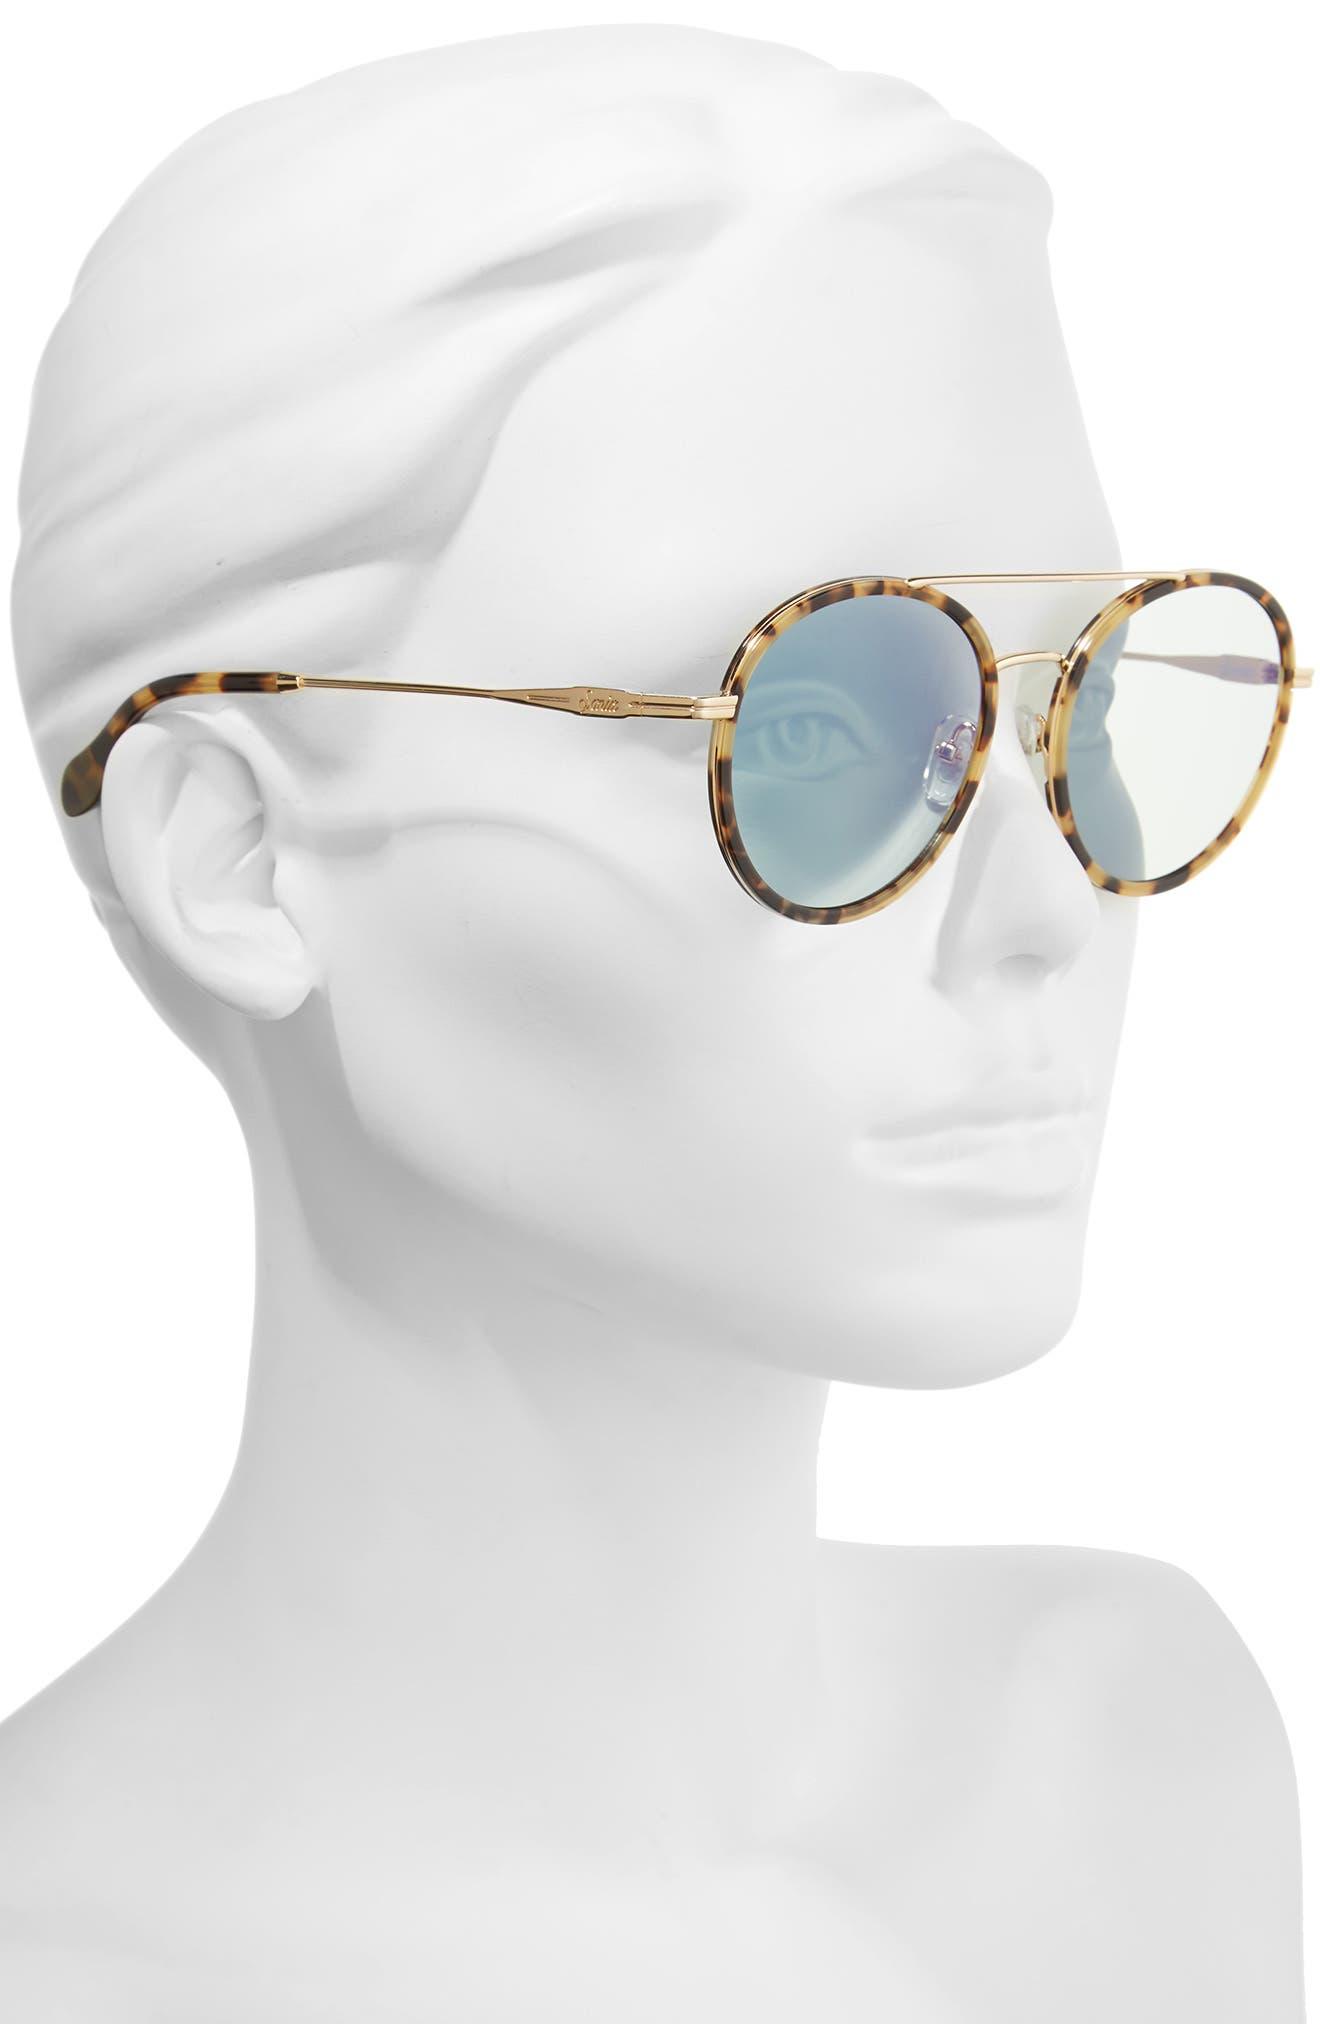 Charli 50mm Mirrored Lens Round Sunglasses,                             Alternate thumbnail 7, color,